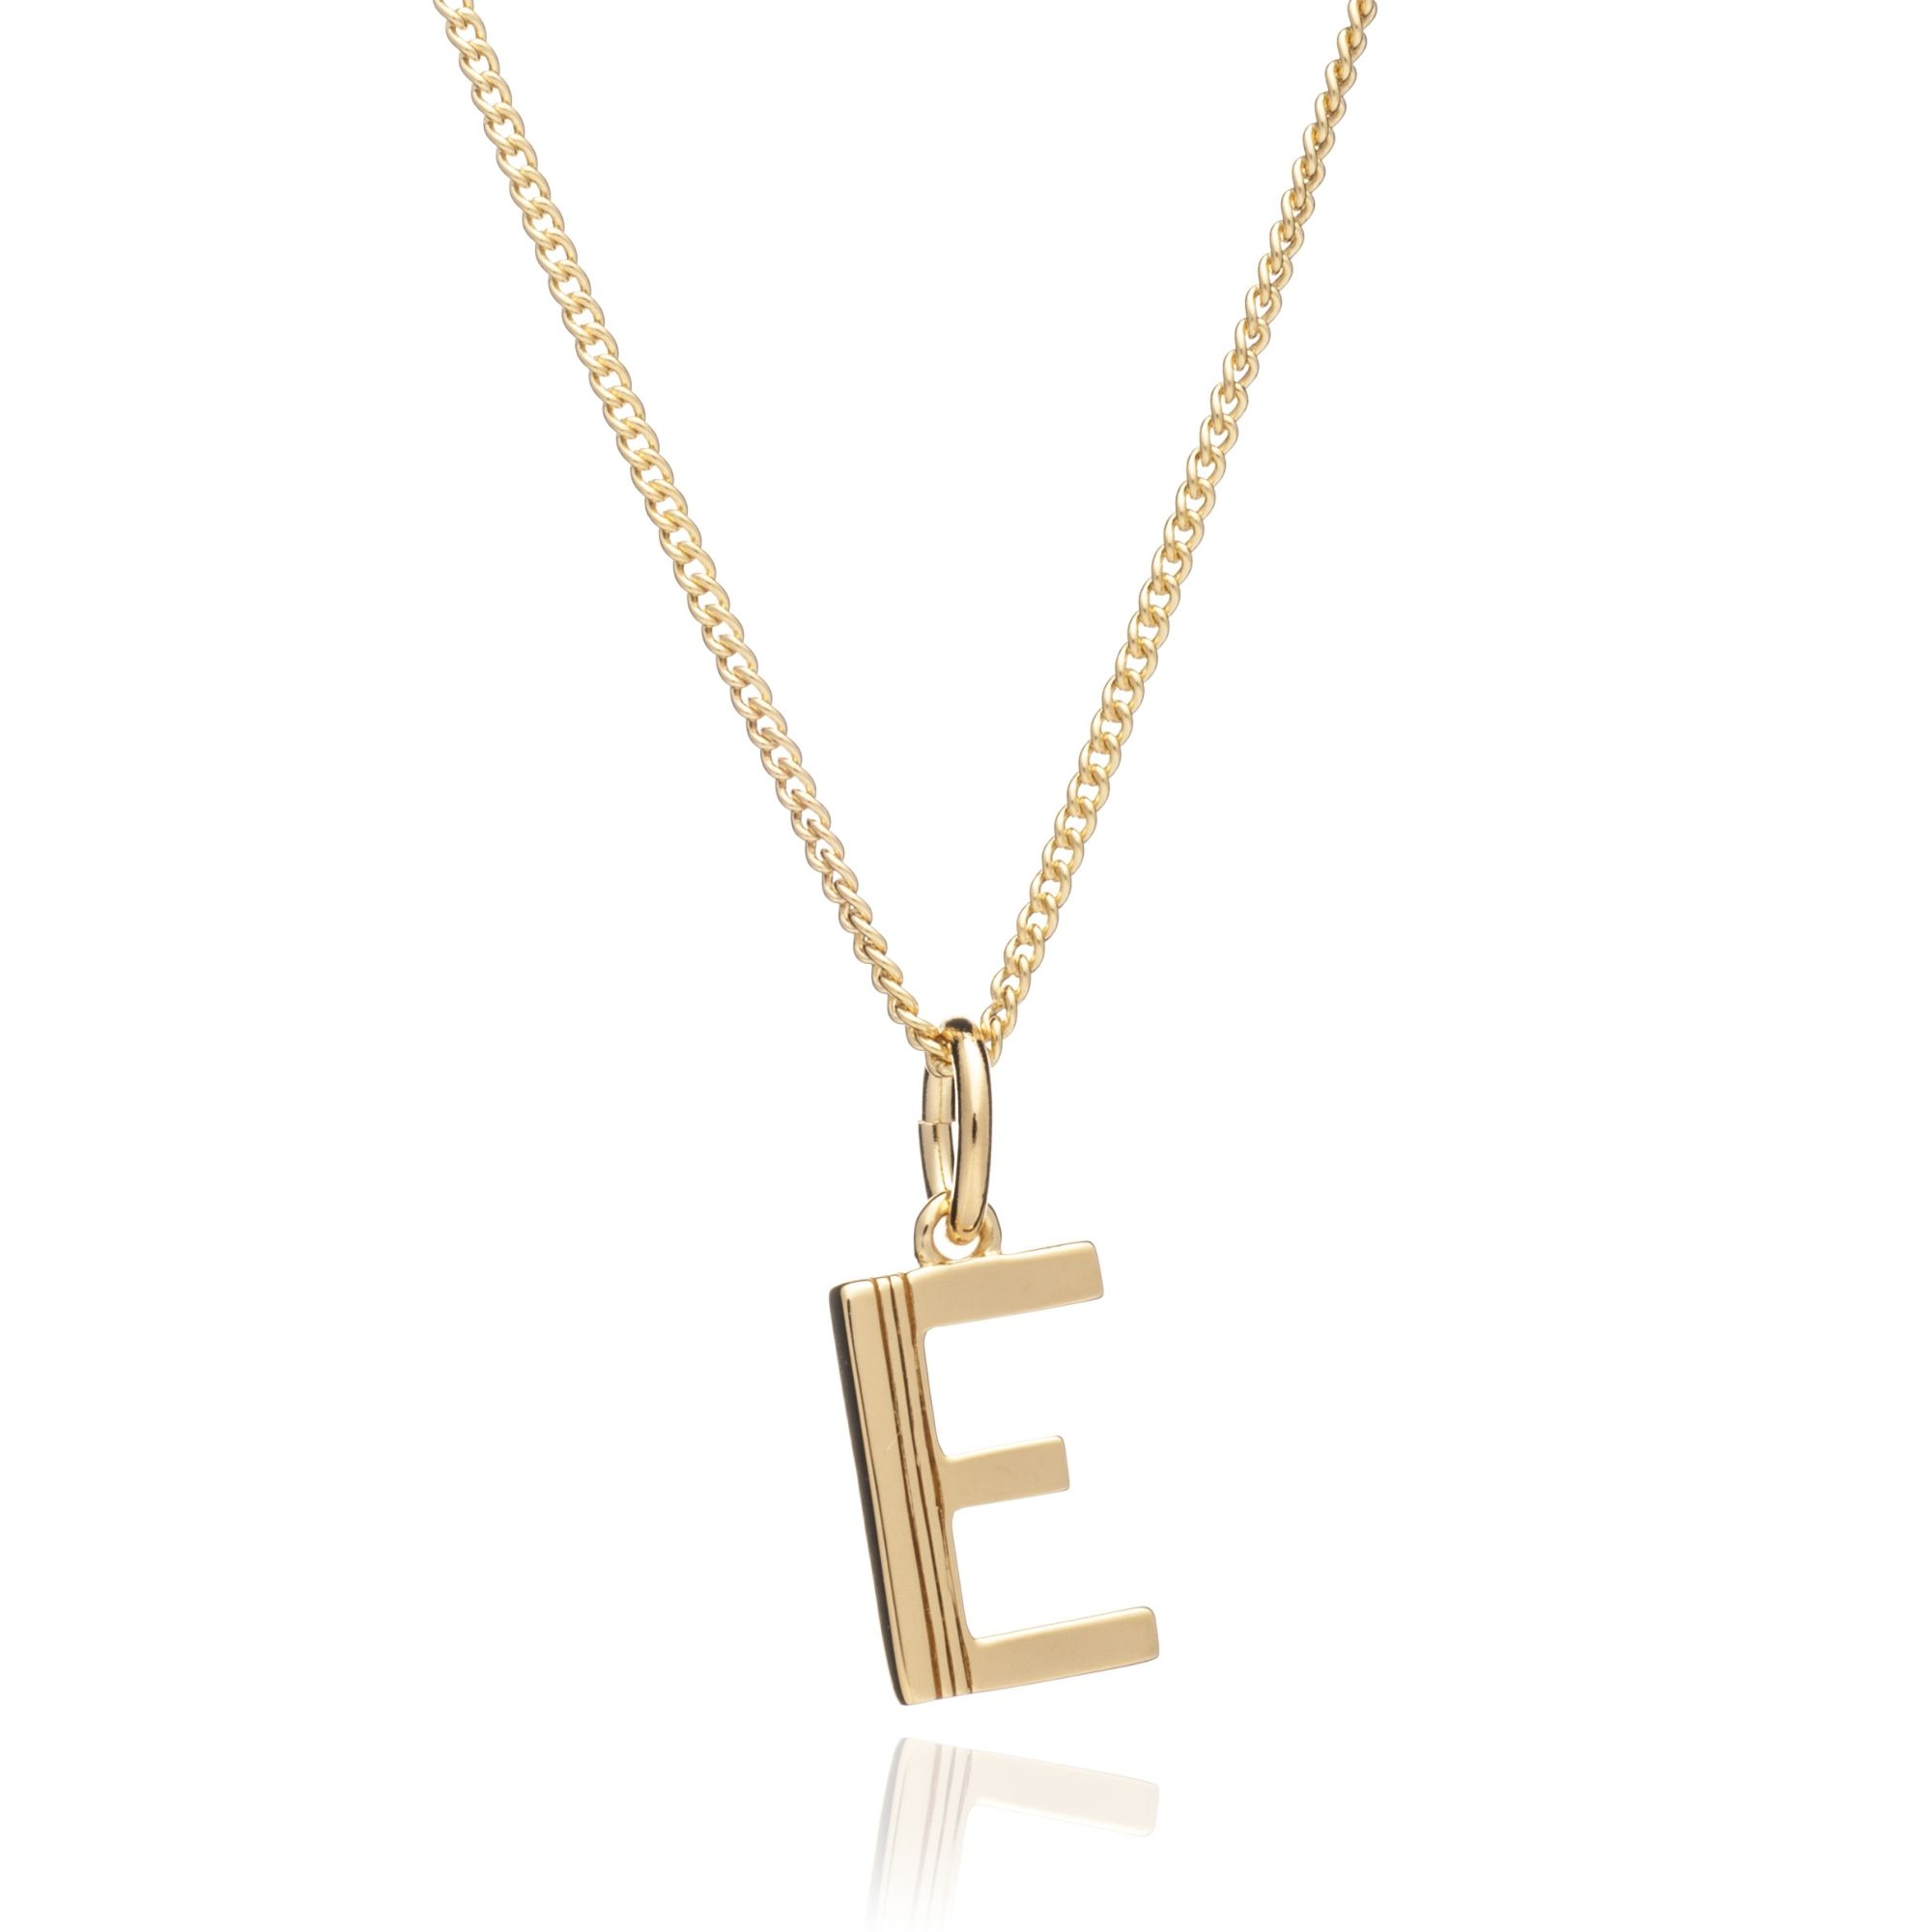 Pin by elizabeth starkey on accessories for weirdos pinterest